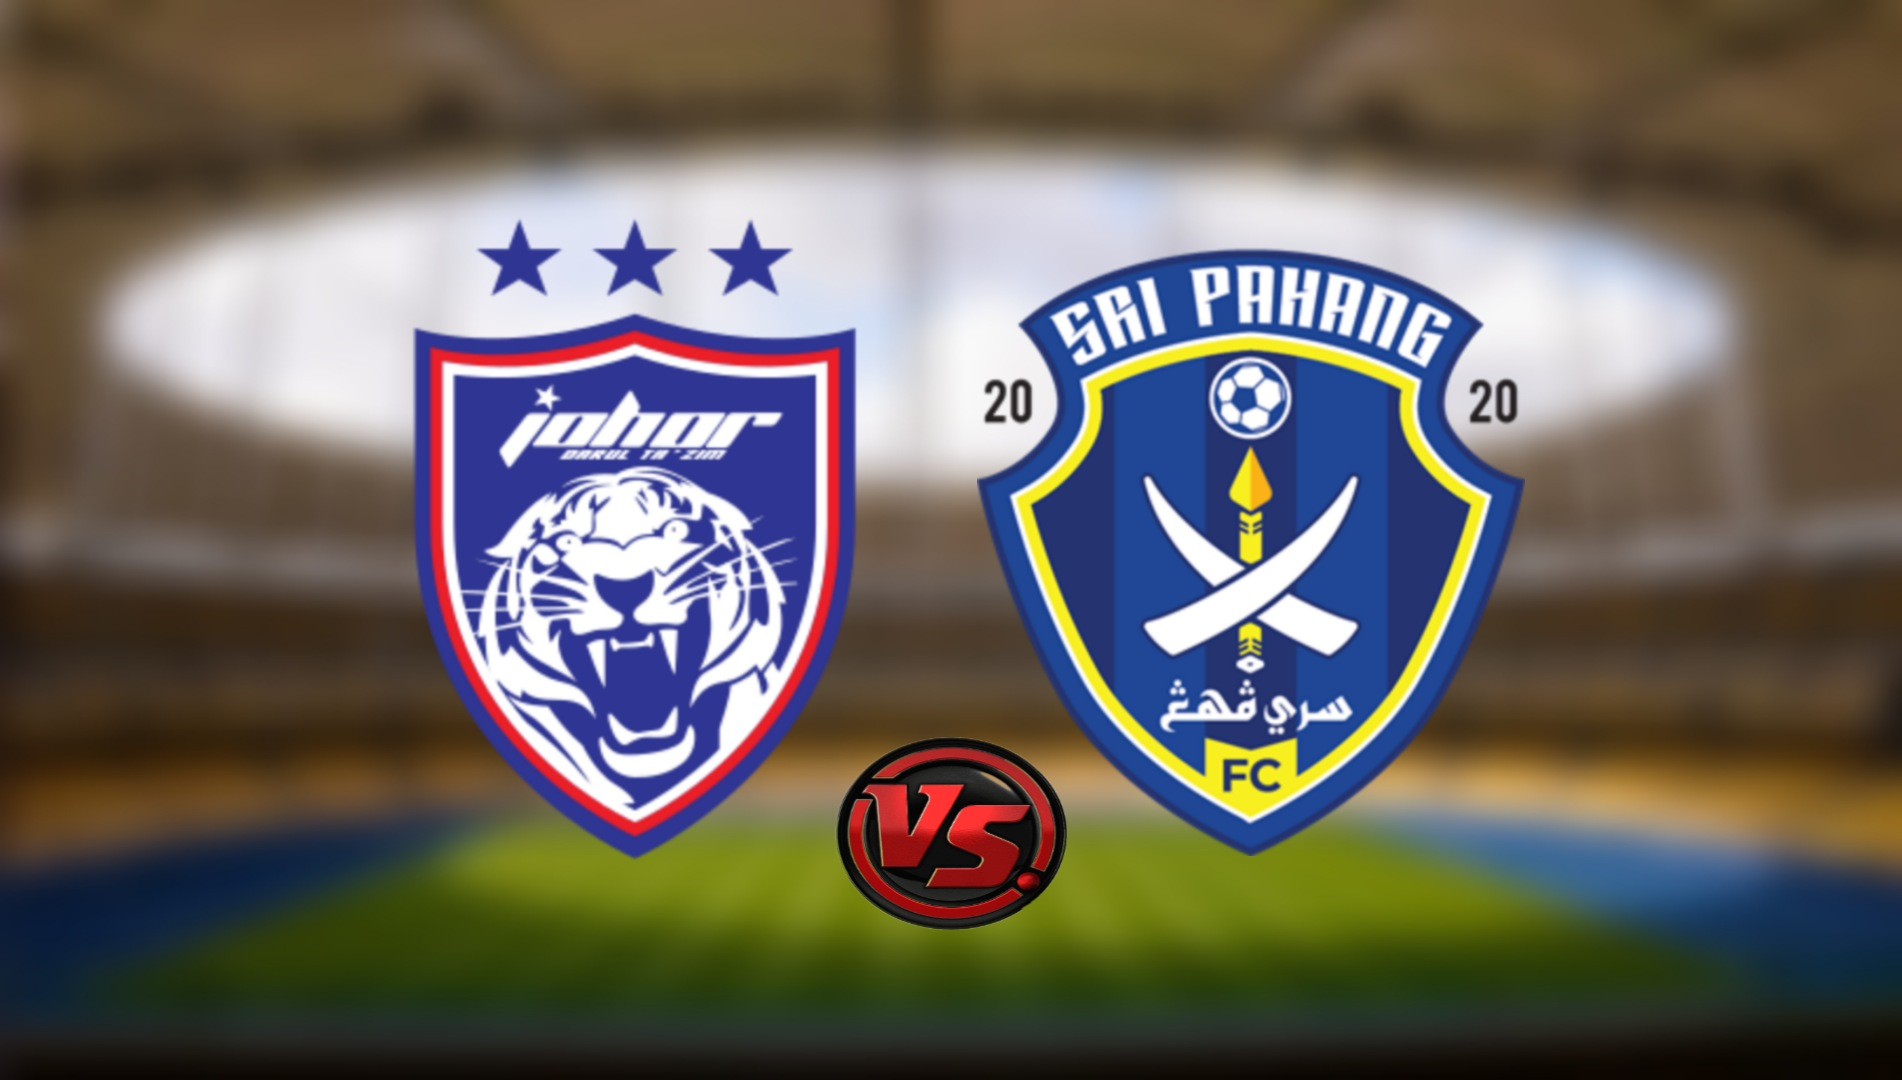 Live Streaming JDT FC vs Sri Pahang FC Liga Super 27.8.2021